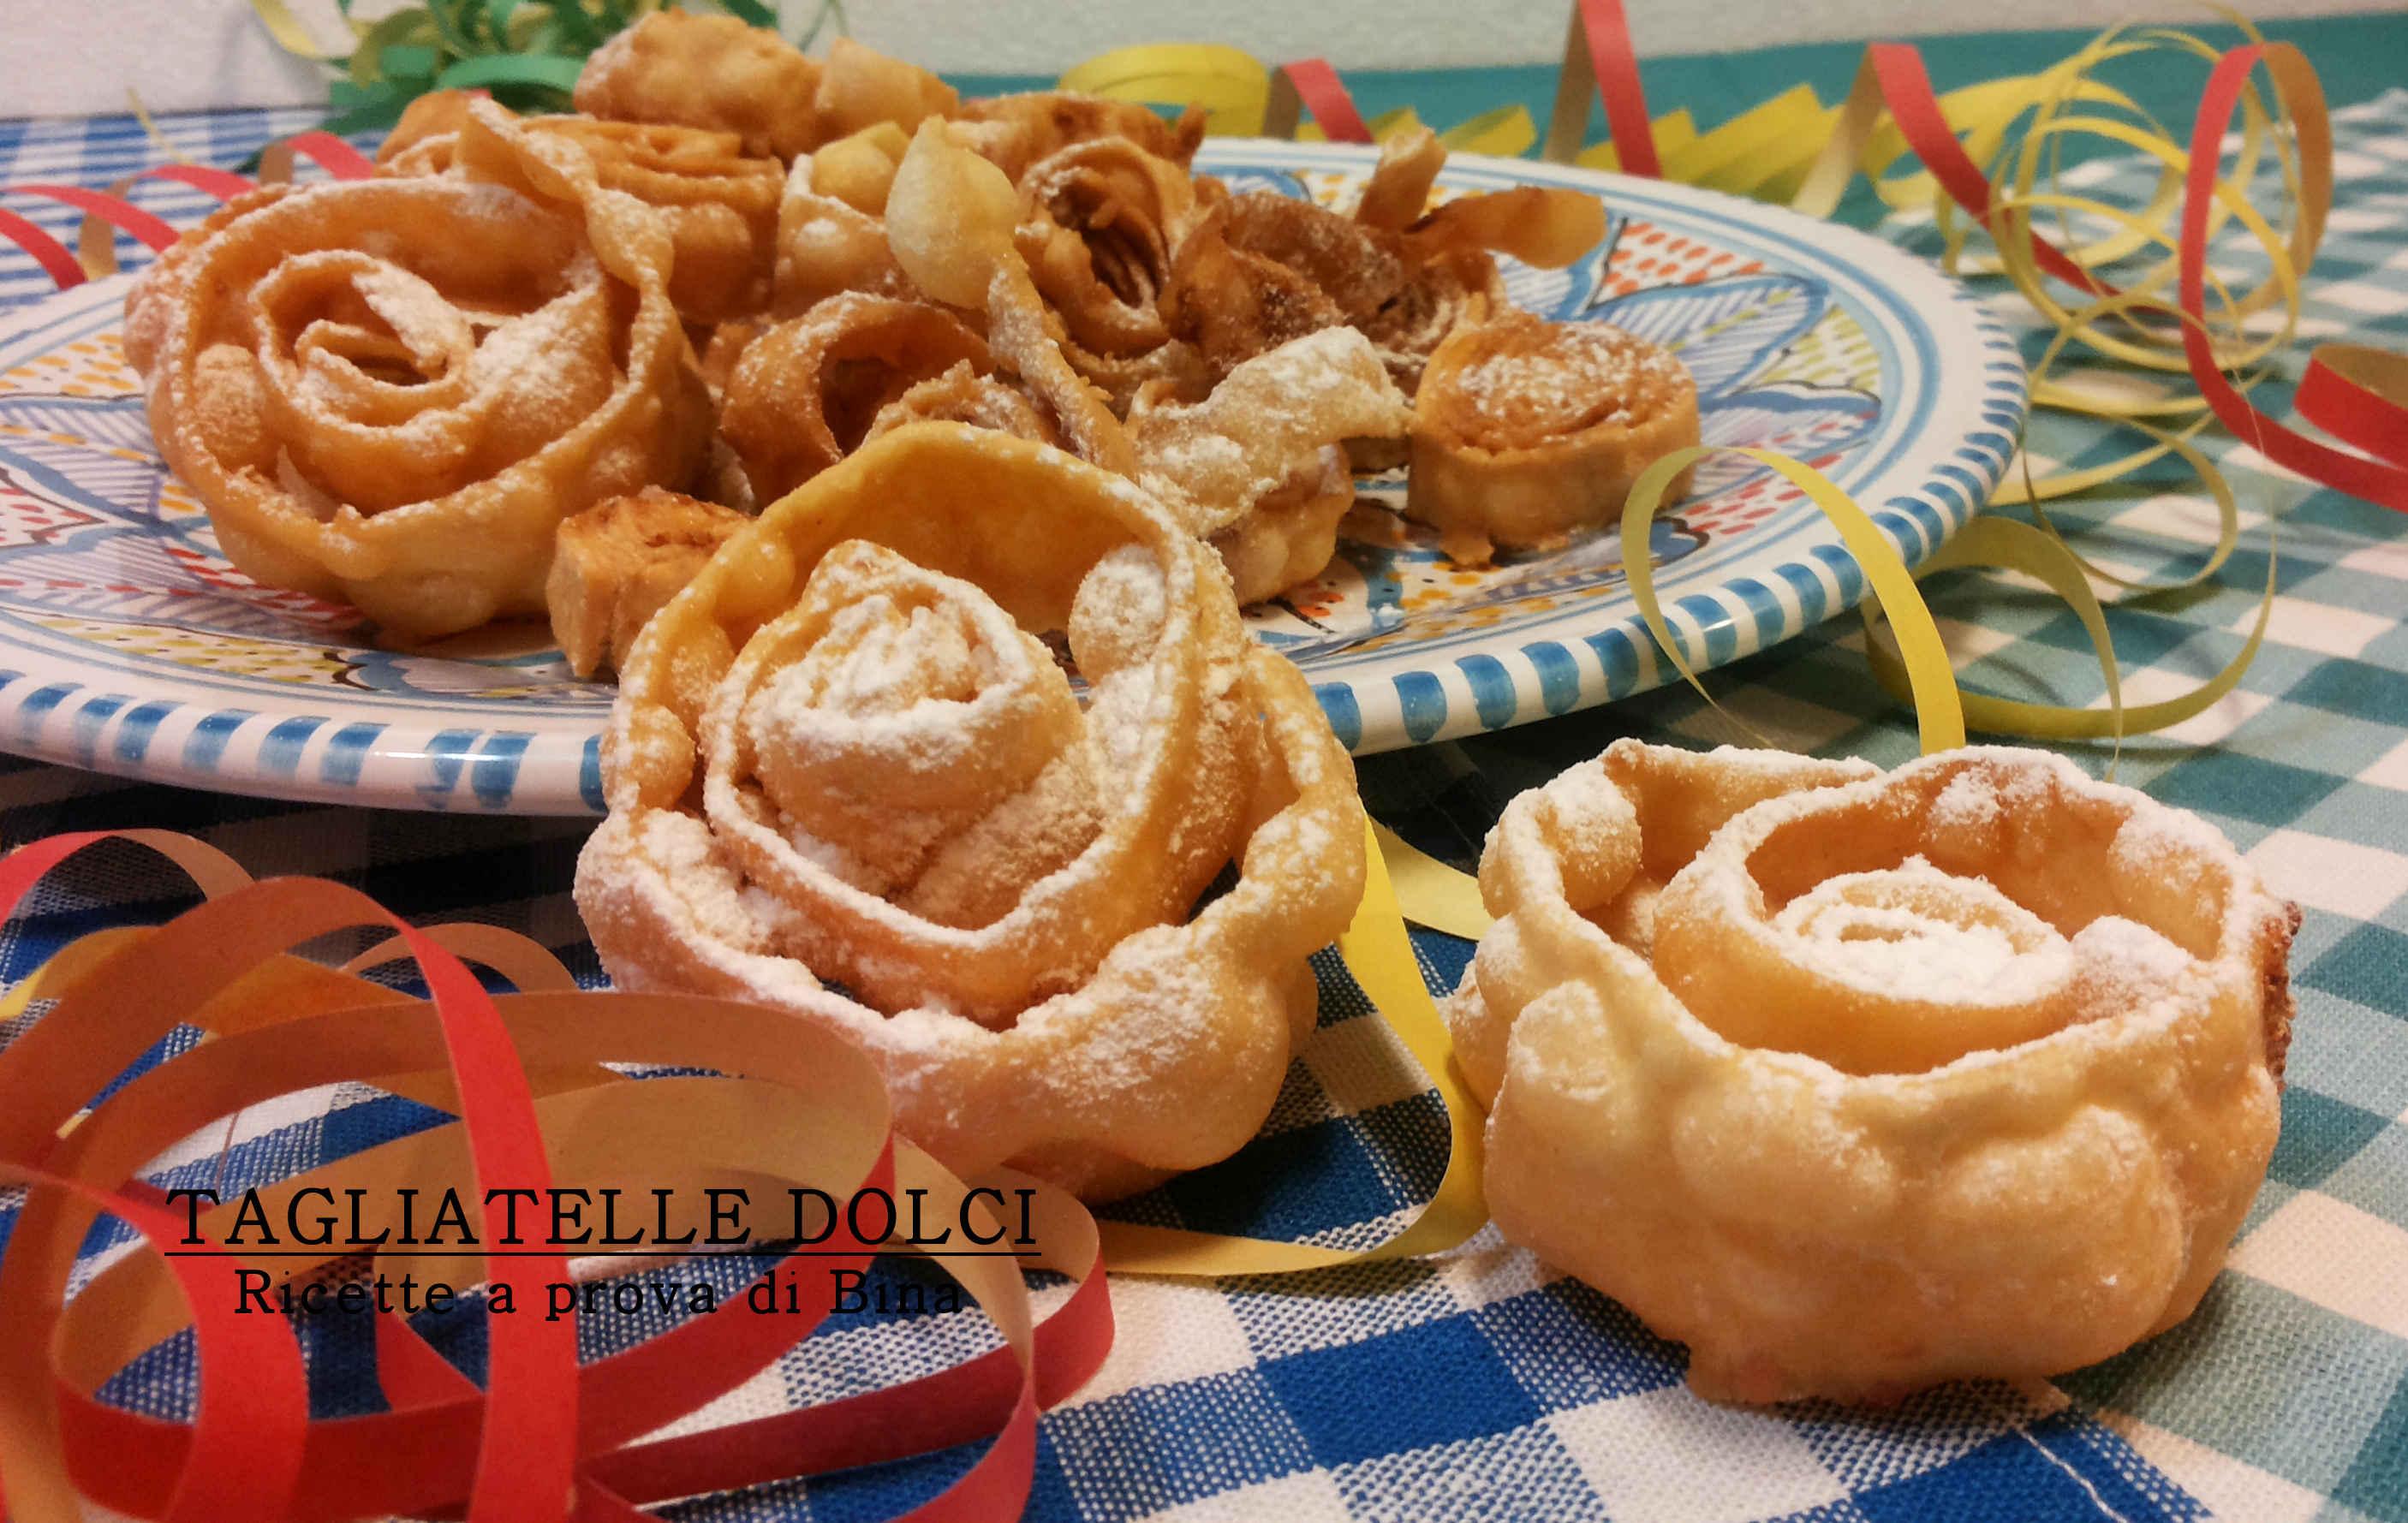 Tagliatelle dolci di carnevale ricetta